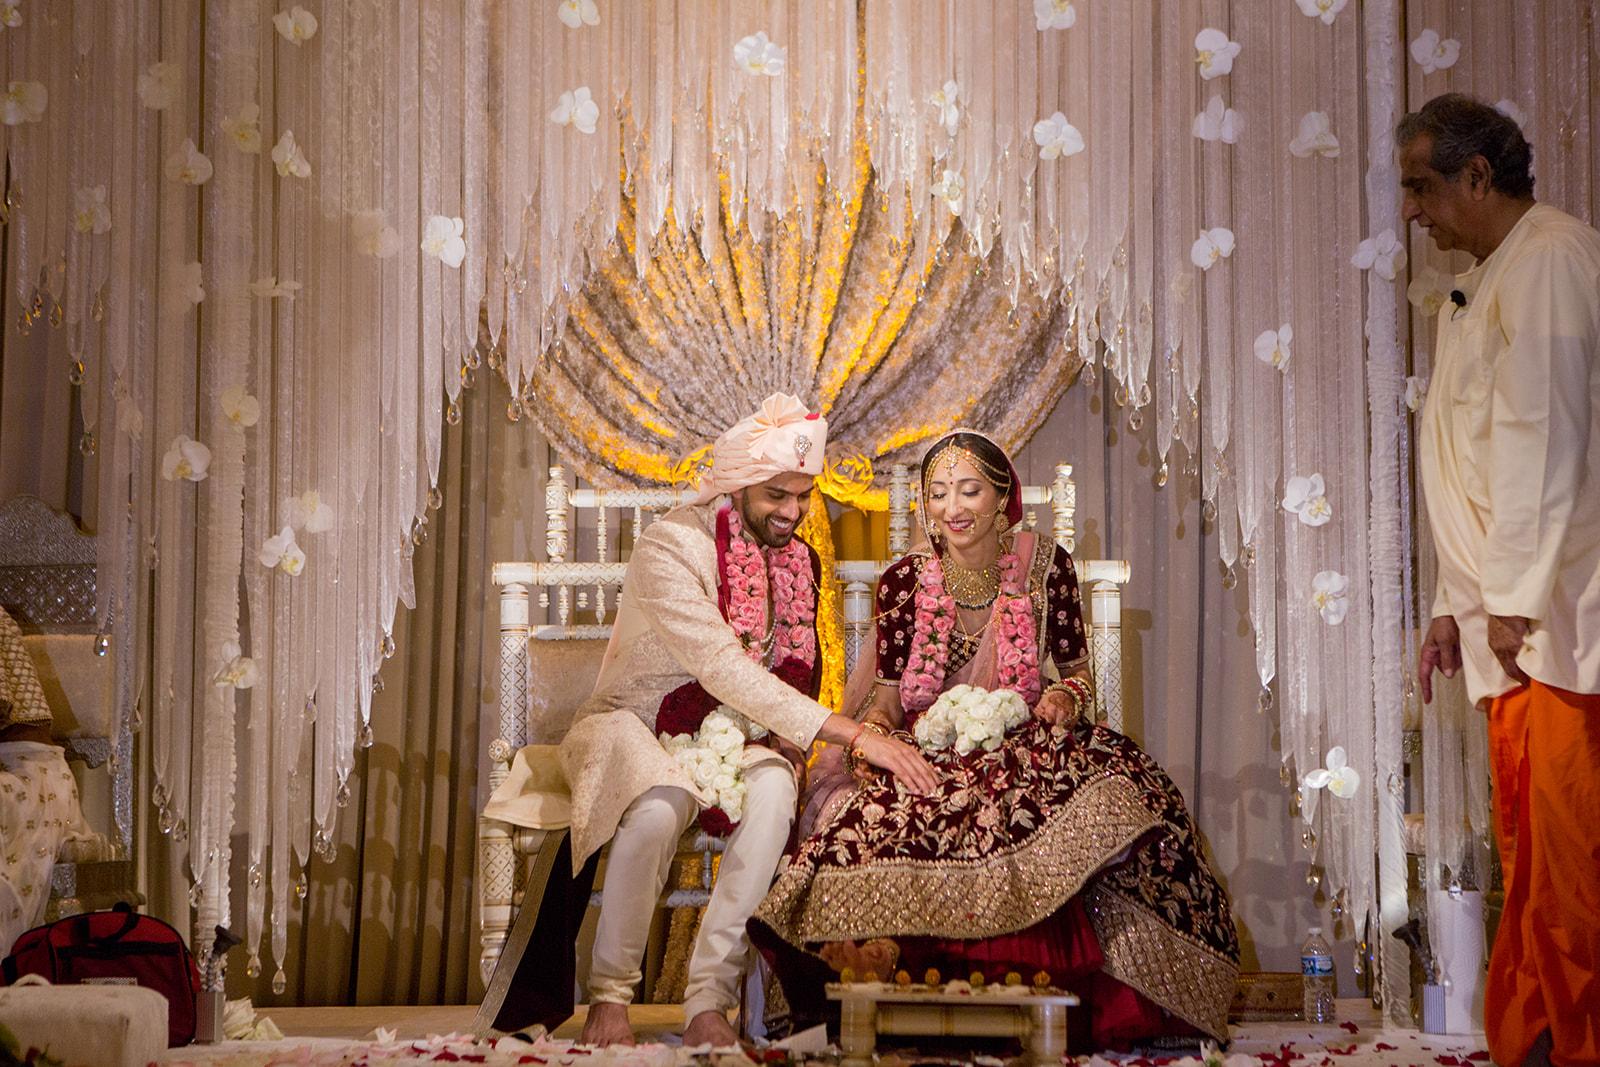 Le Cape Weddings - Puja and Kheelan - Ceremony -64.jpg